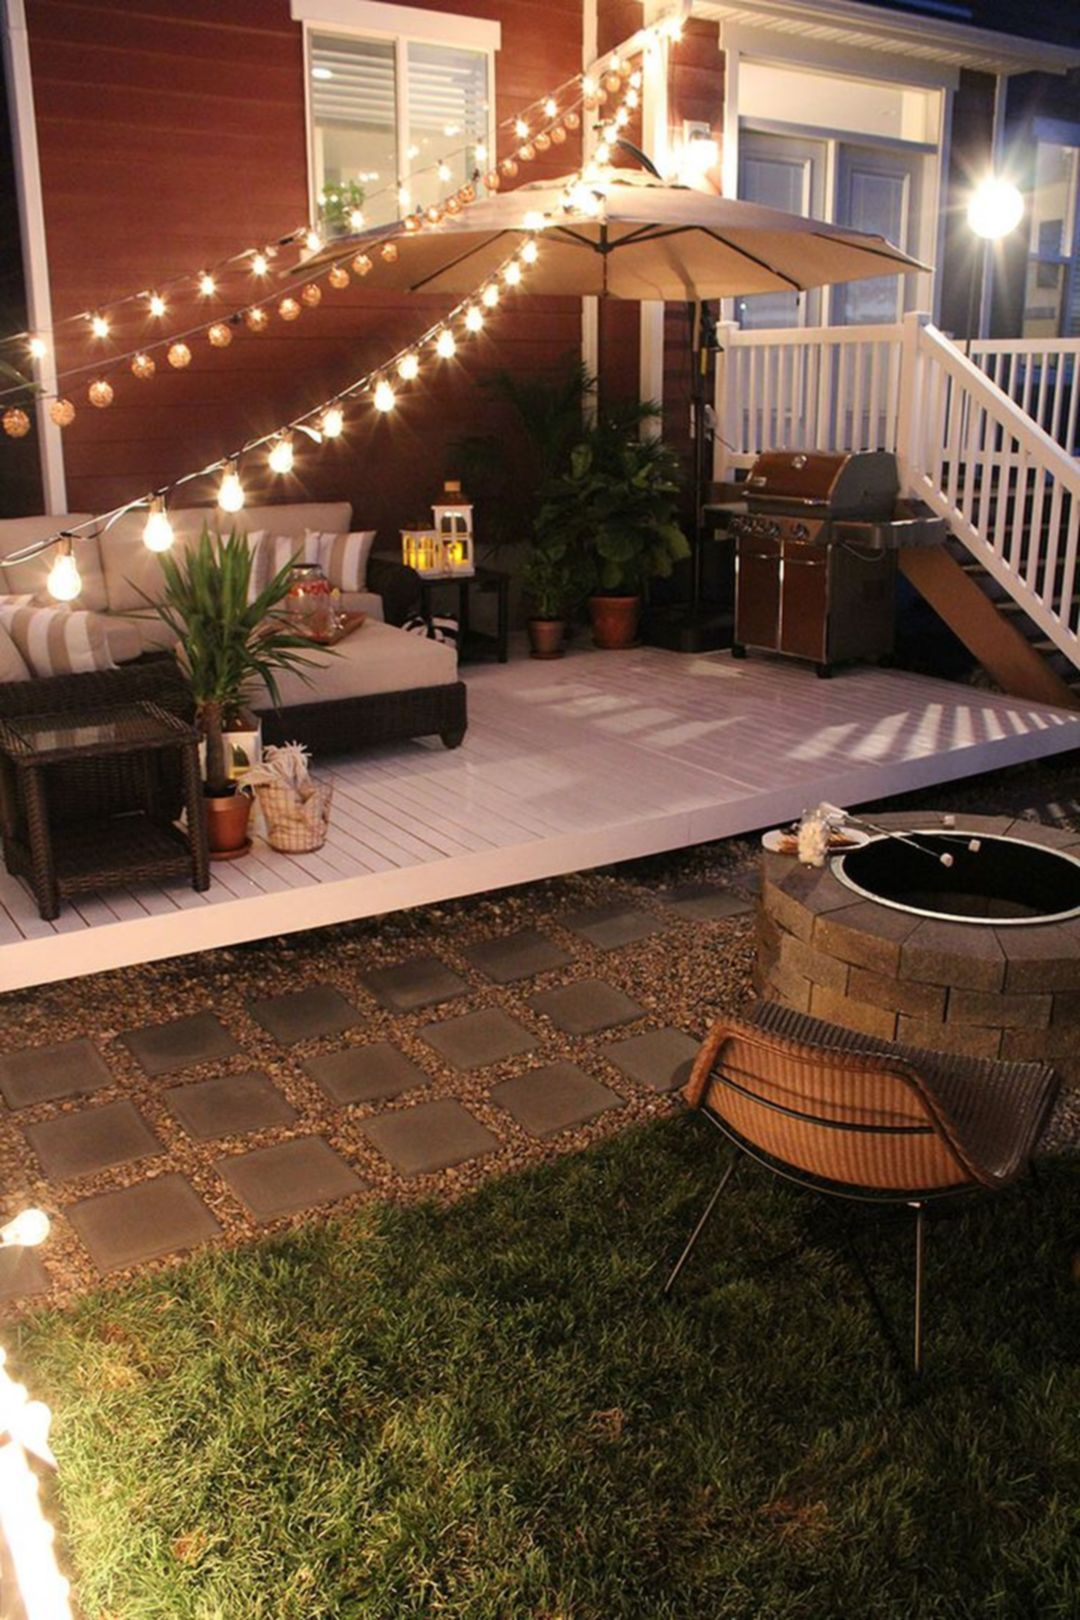 Top 20 Wonderful Deck Decorating Ideas On A Budget Budget Patio Diy Patio Patio Lighting